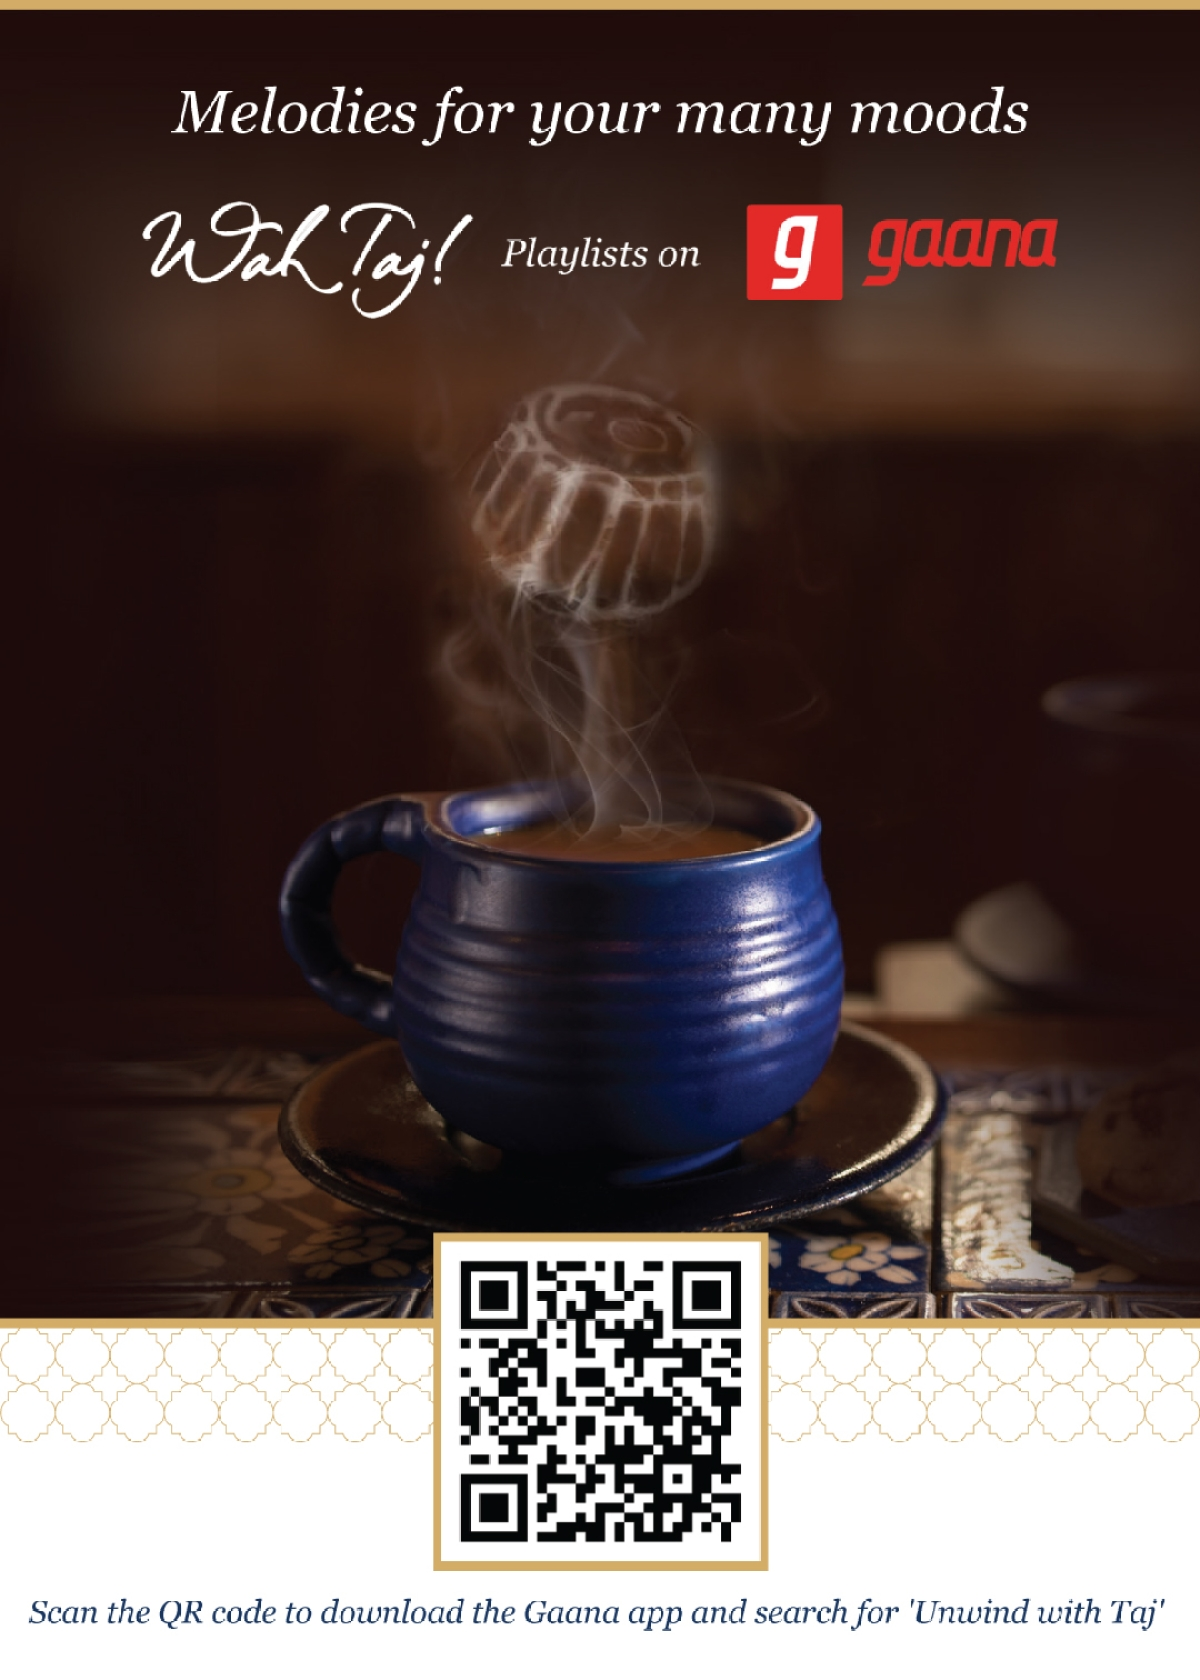 Gaana partners with Taj Mahal tea to create curated Indian classical music playlist